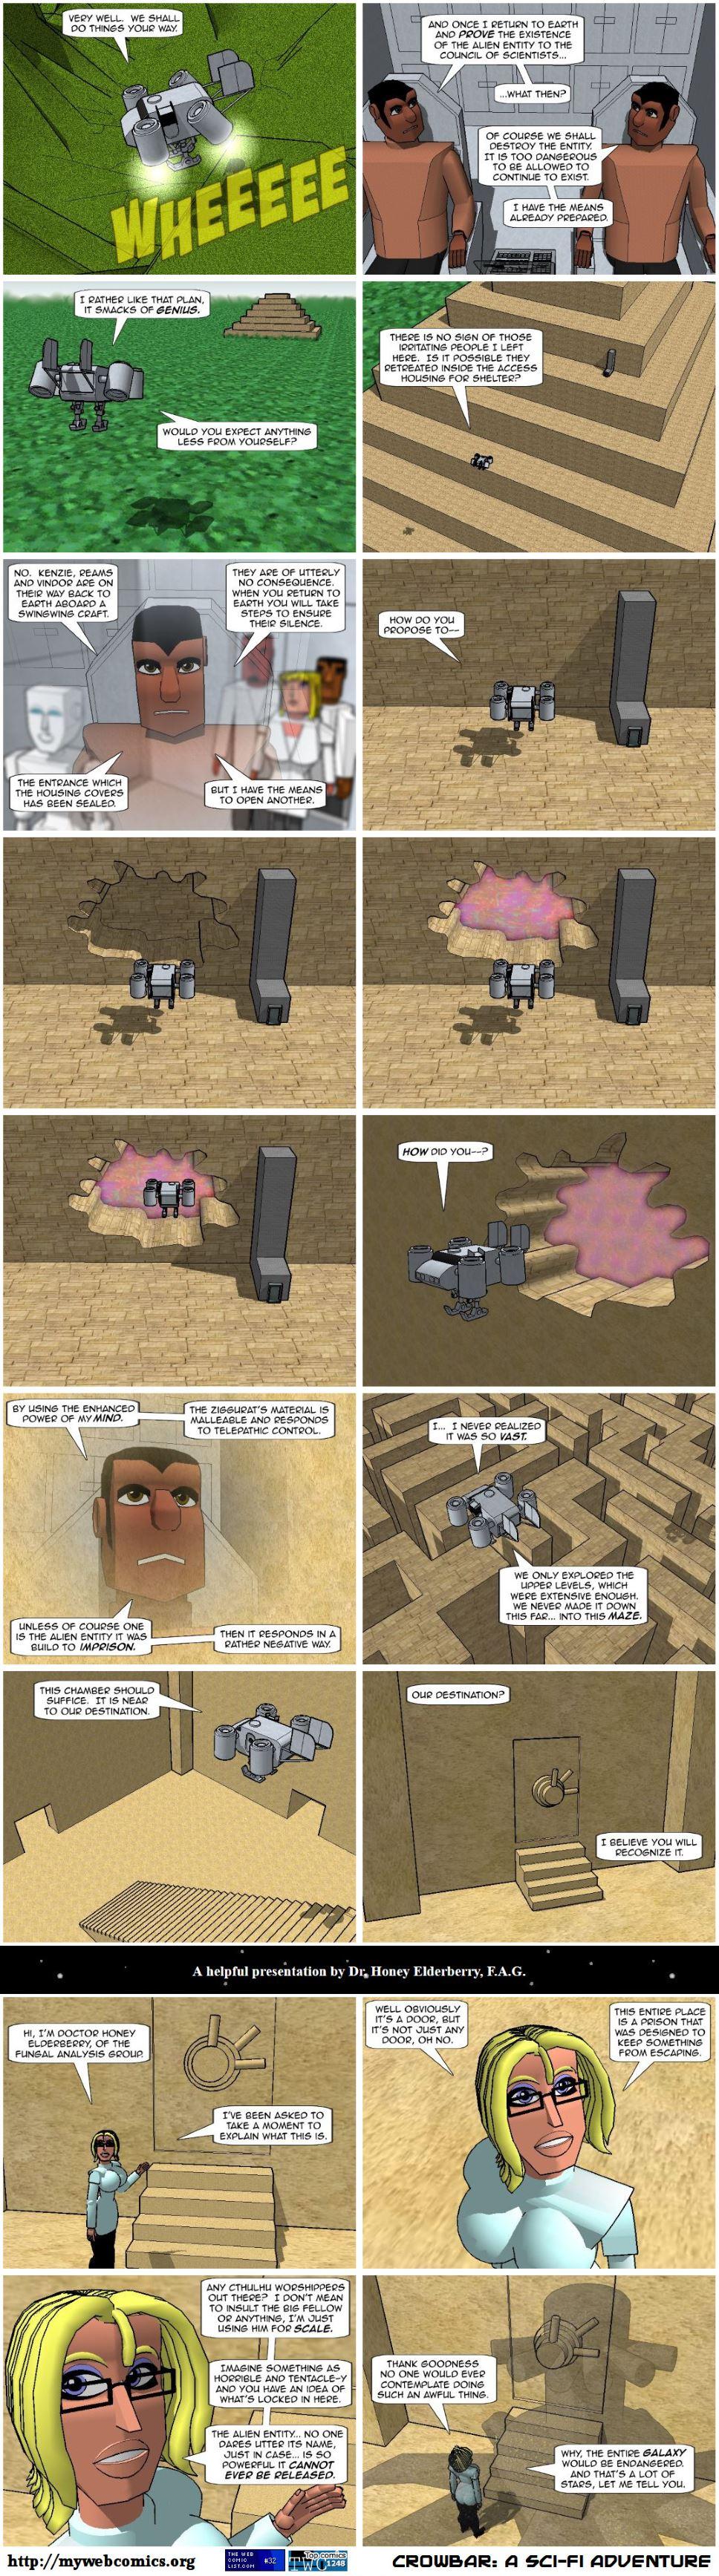 Back to the ziggurat.